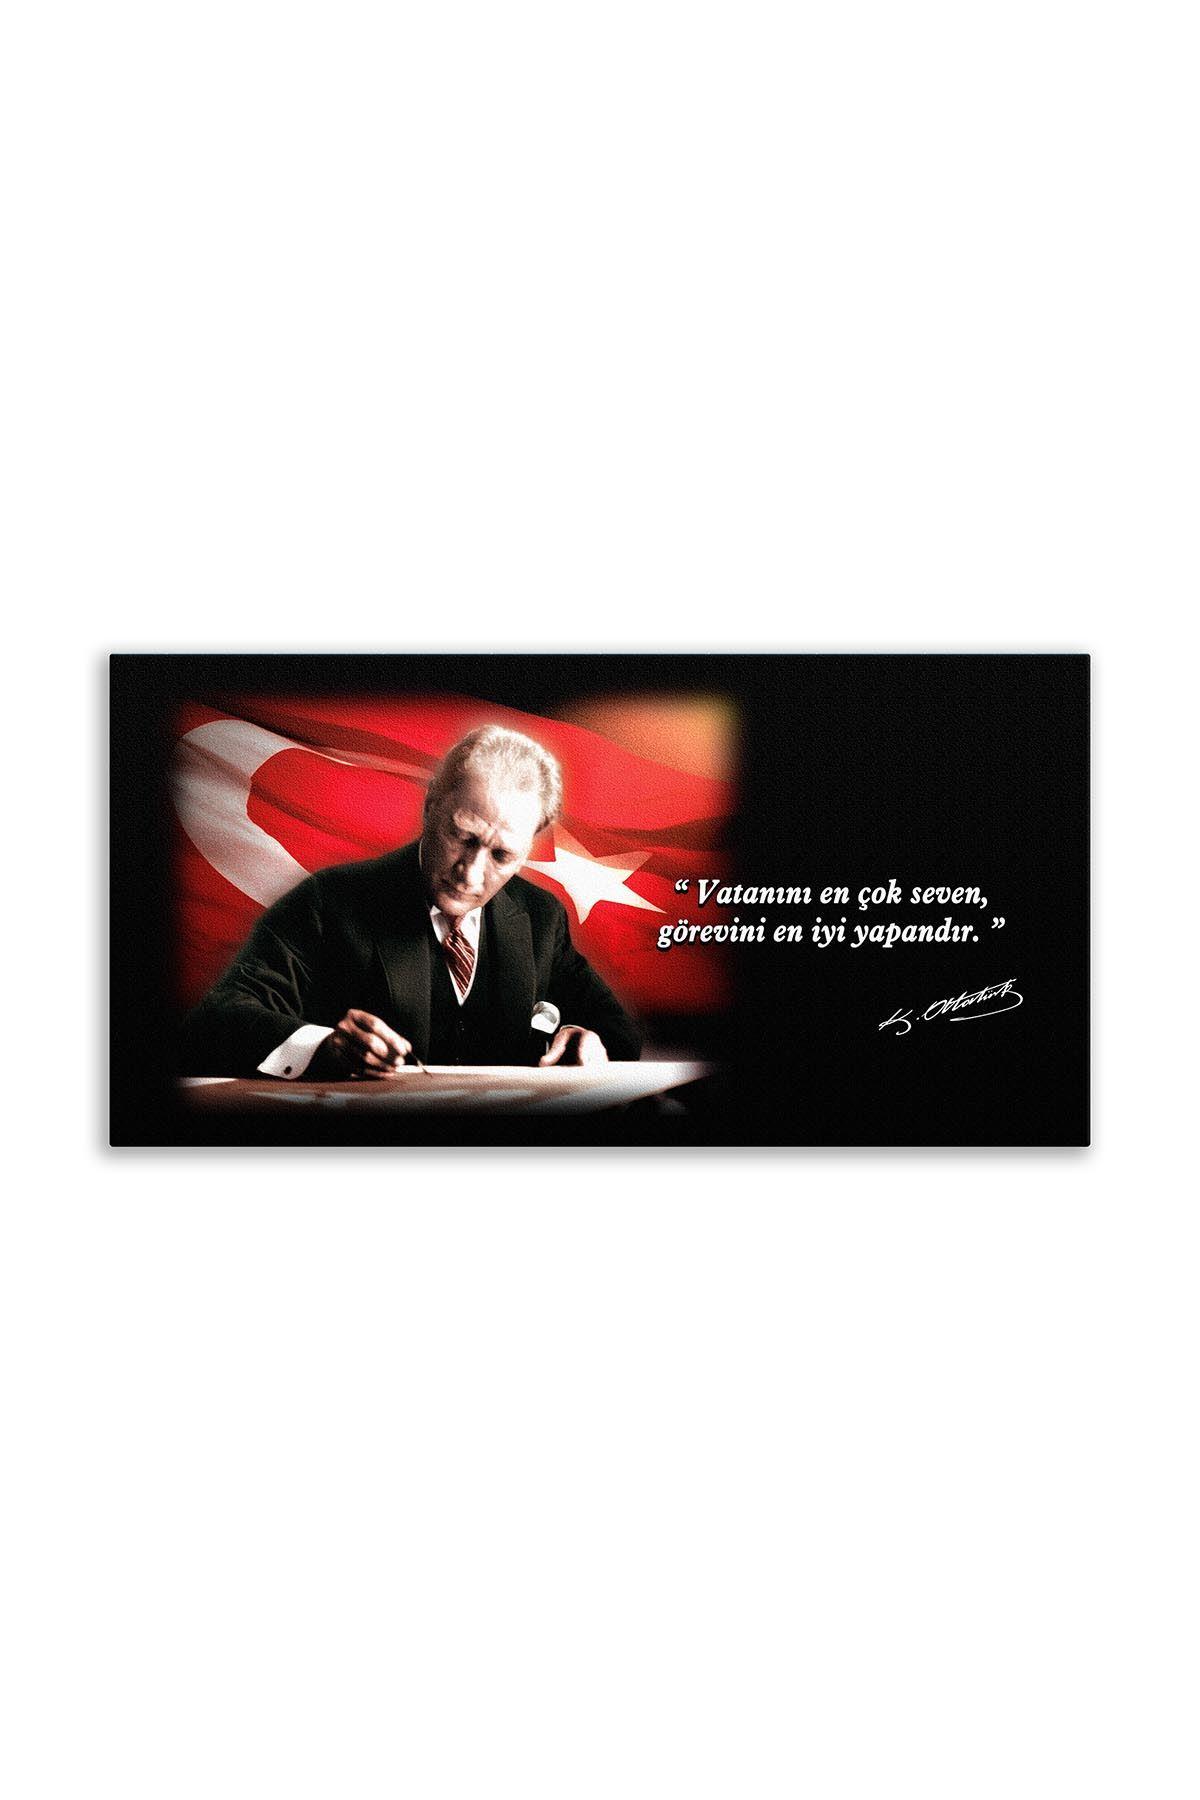 Atatürk Canvas Board With Turkish Flag   Printed Canvas Board   Customized Canvas Board